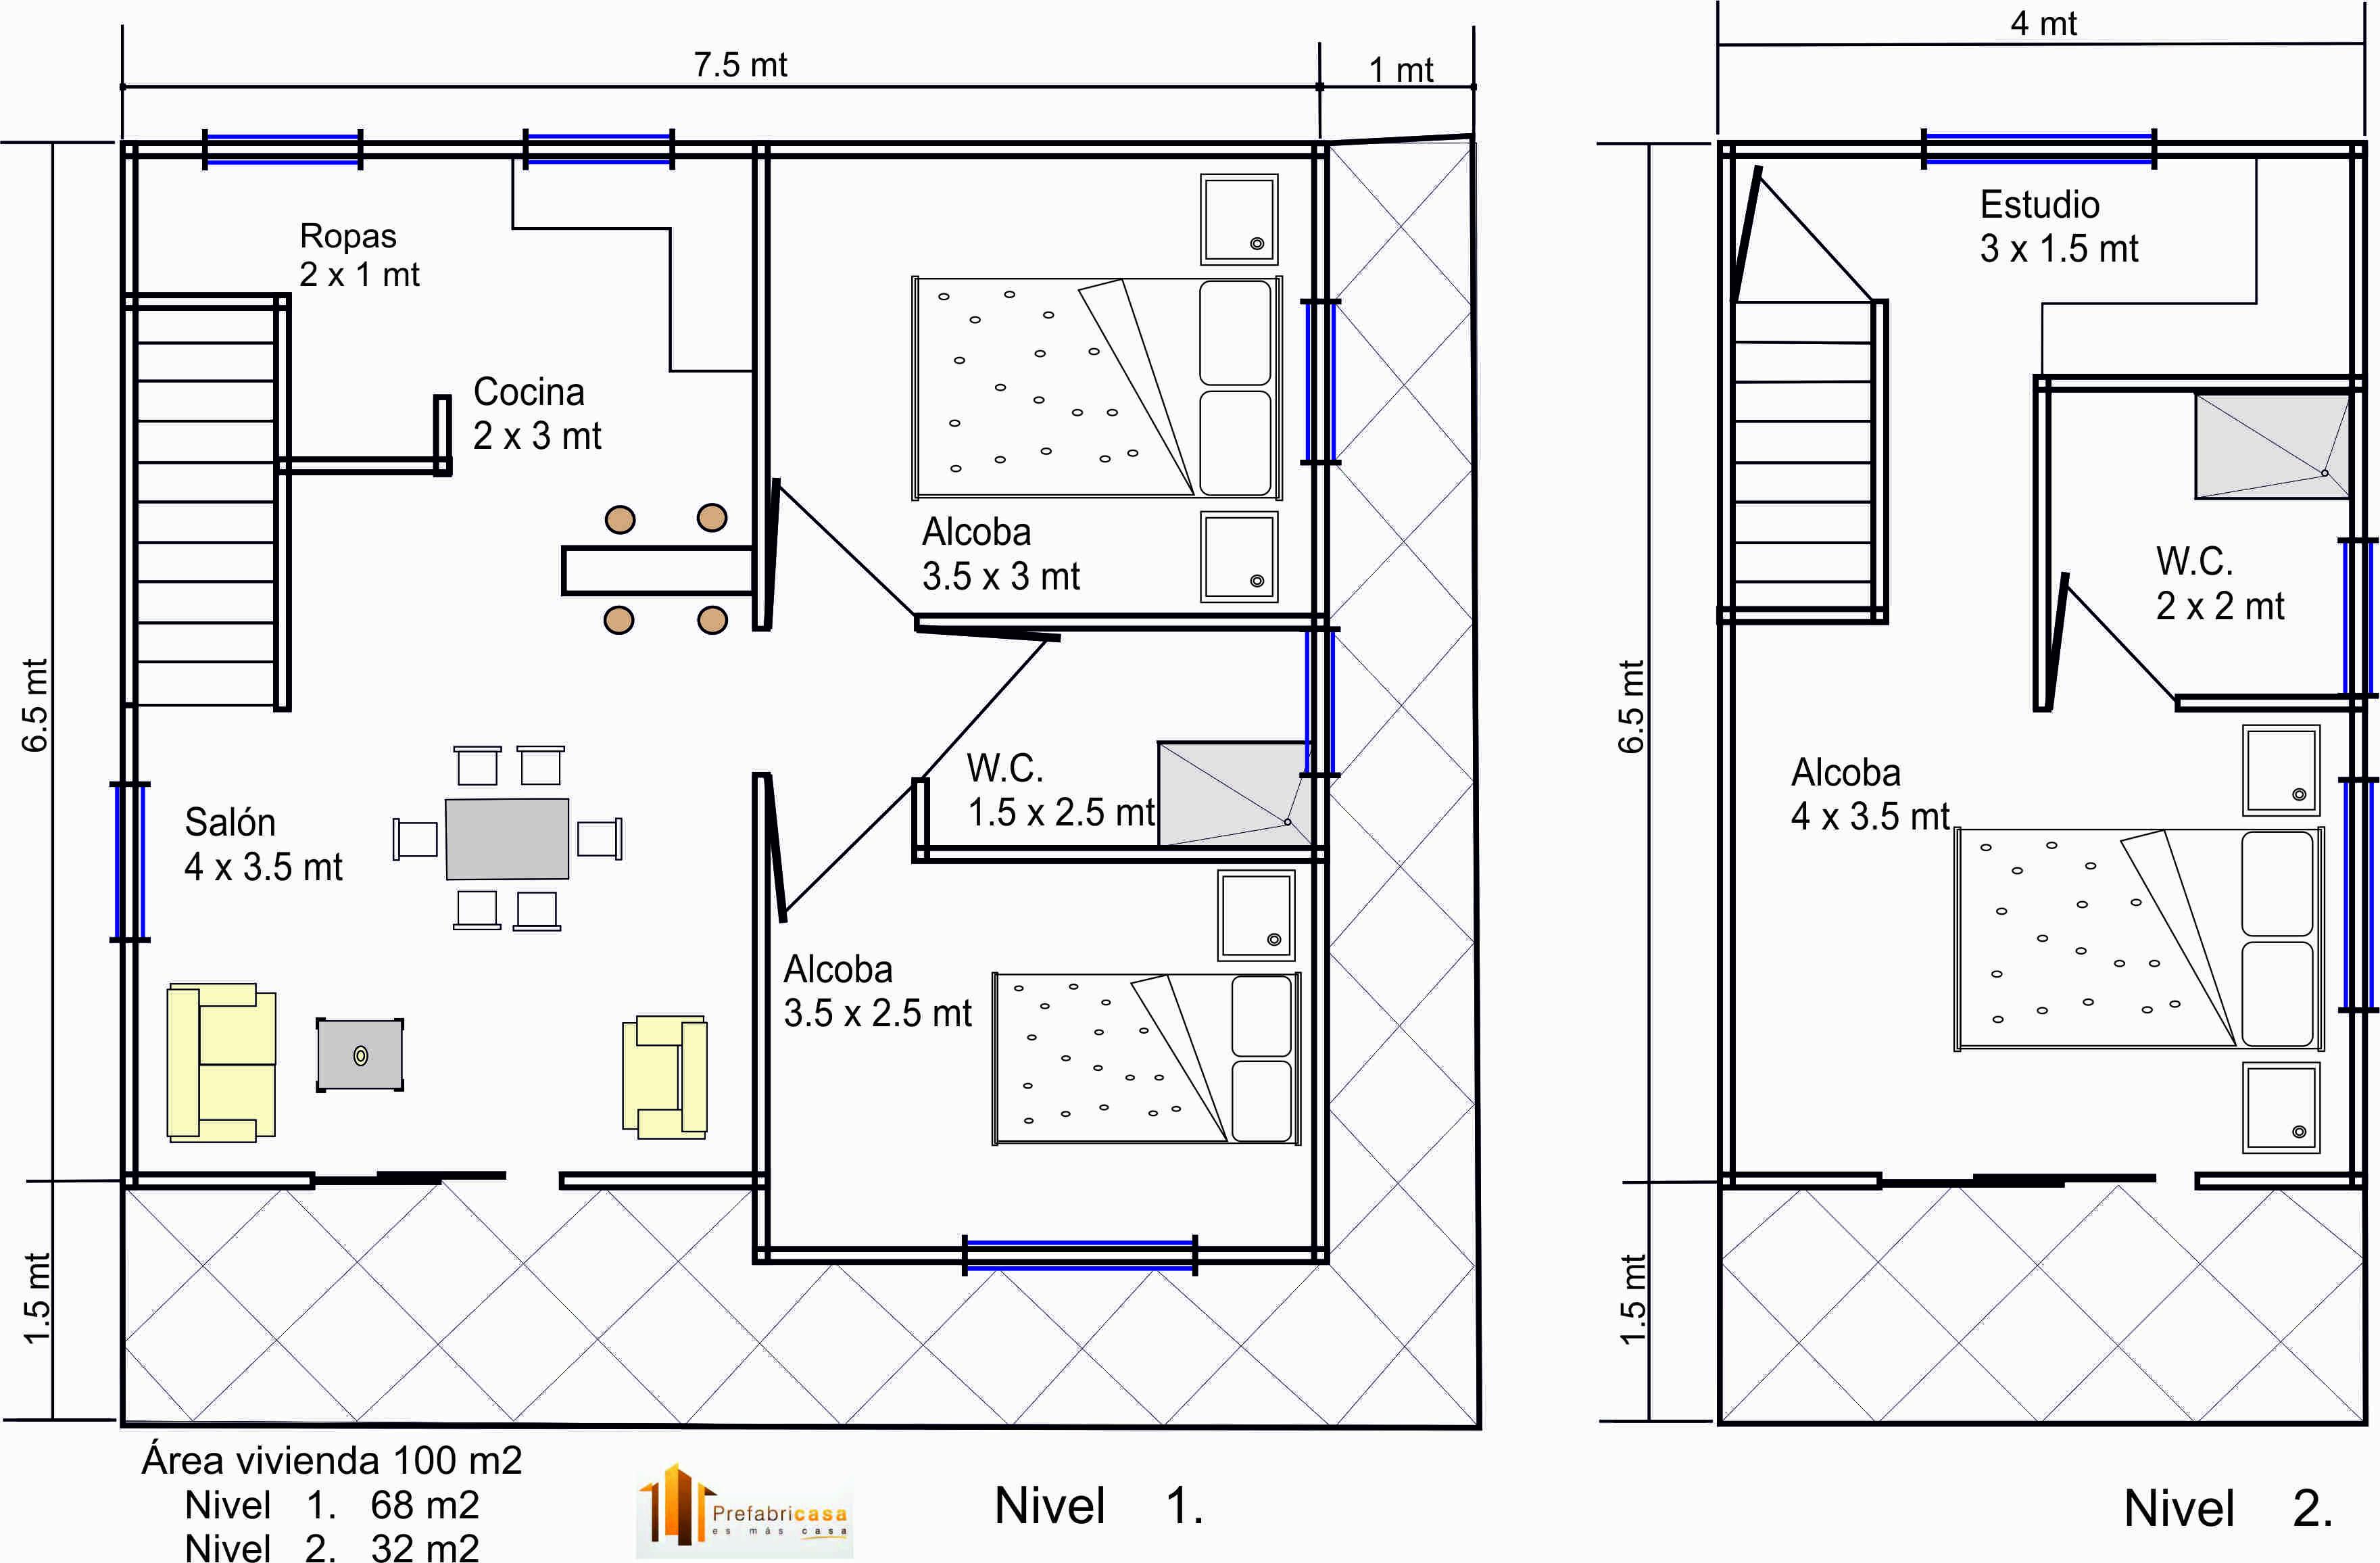 diseños casas prefabricadas 100 mts2 - casas prefabricadas